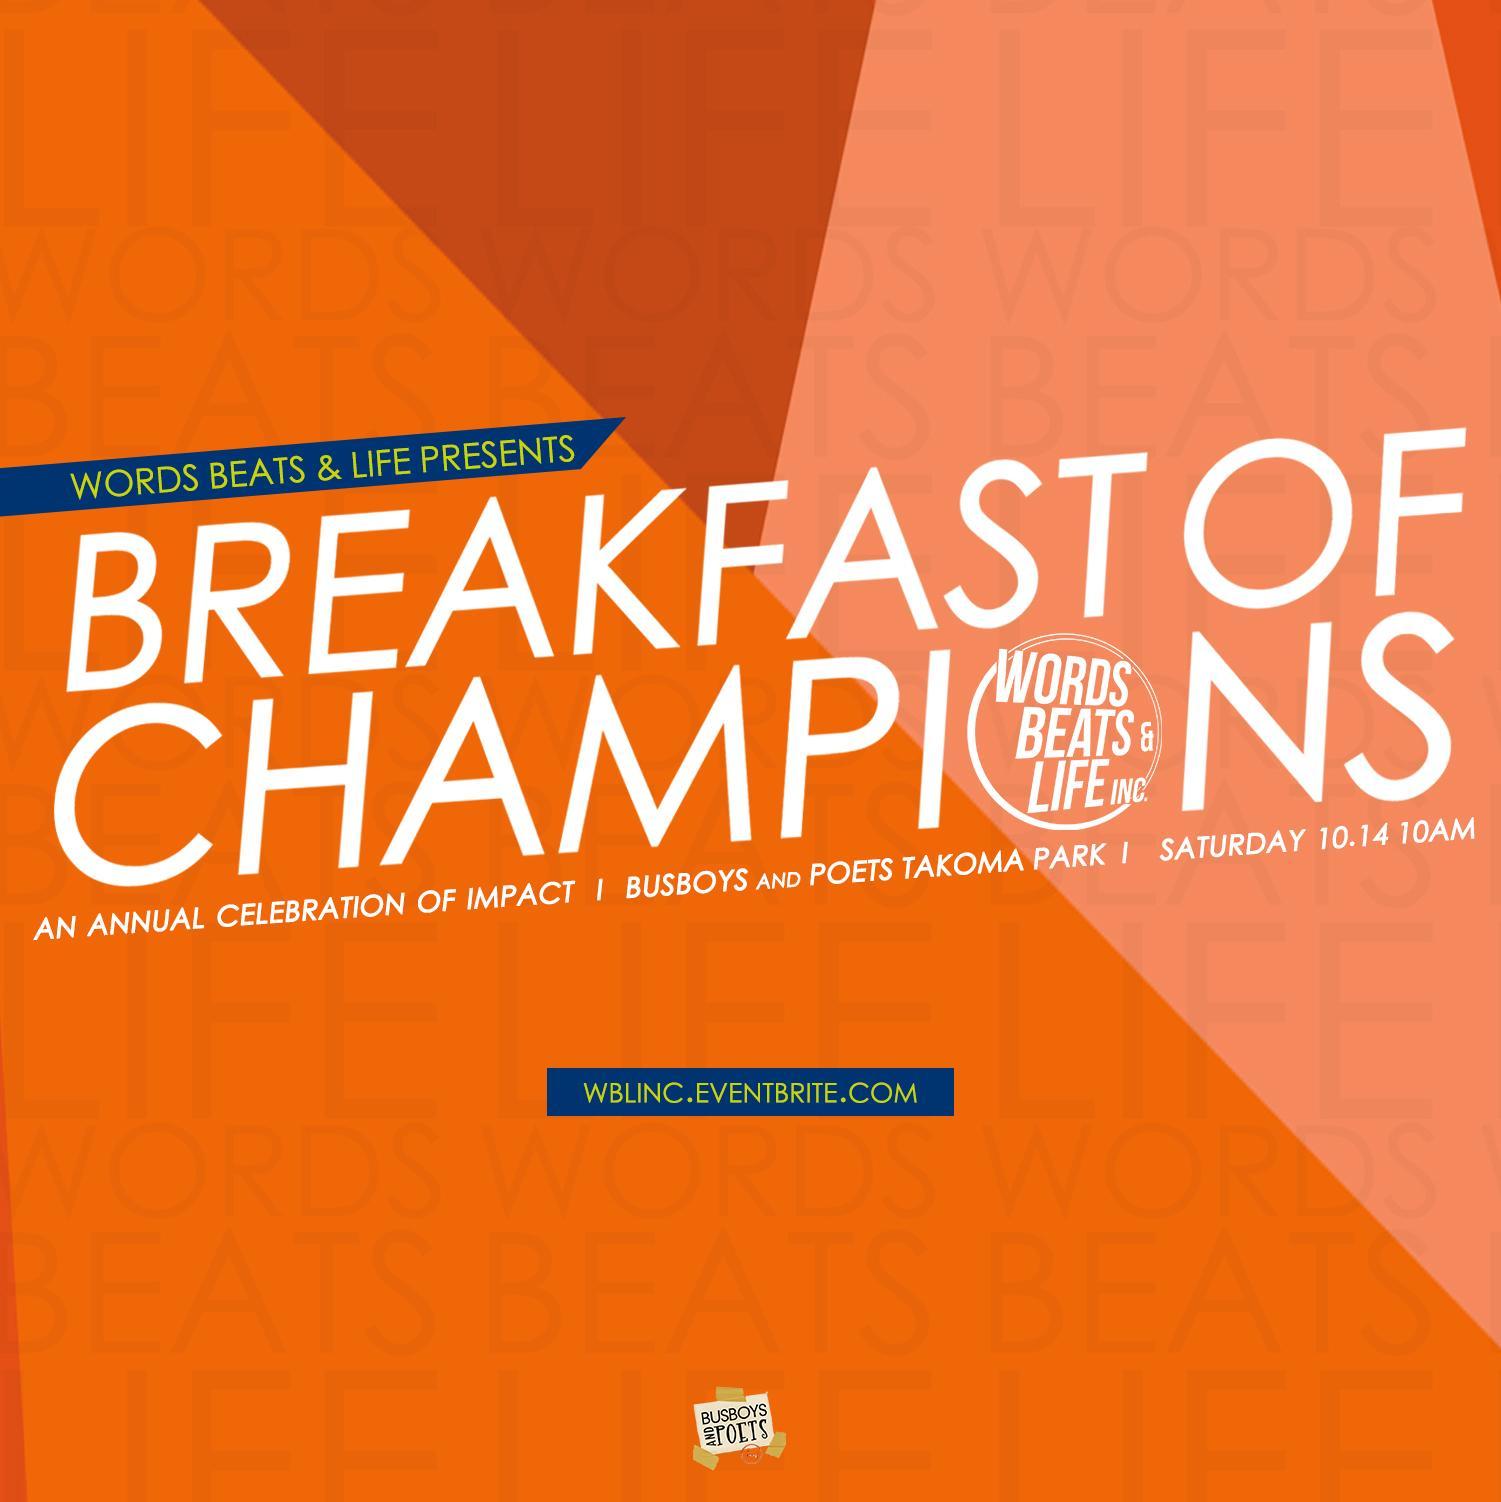 2017 WBL Breakfast of Champions. 2017 WBL Breakfast of Champions